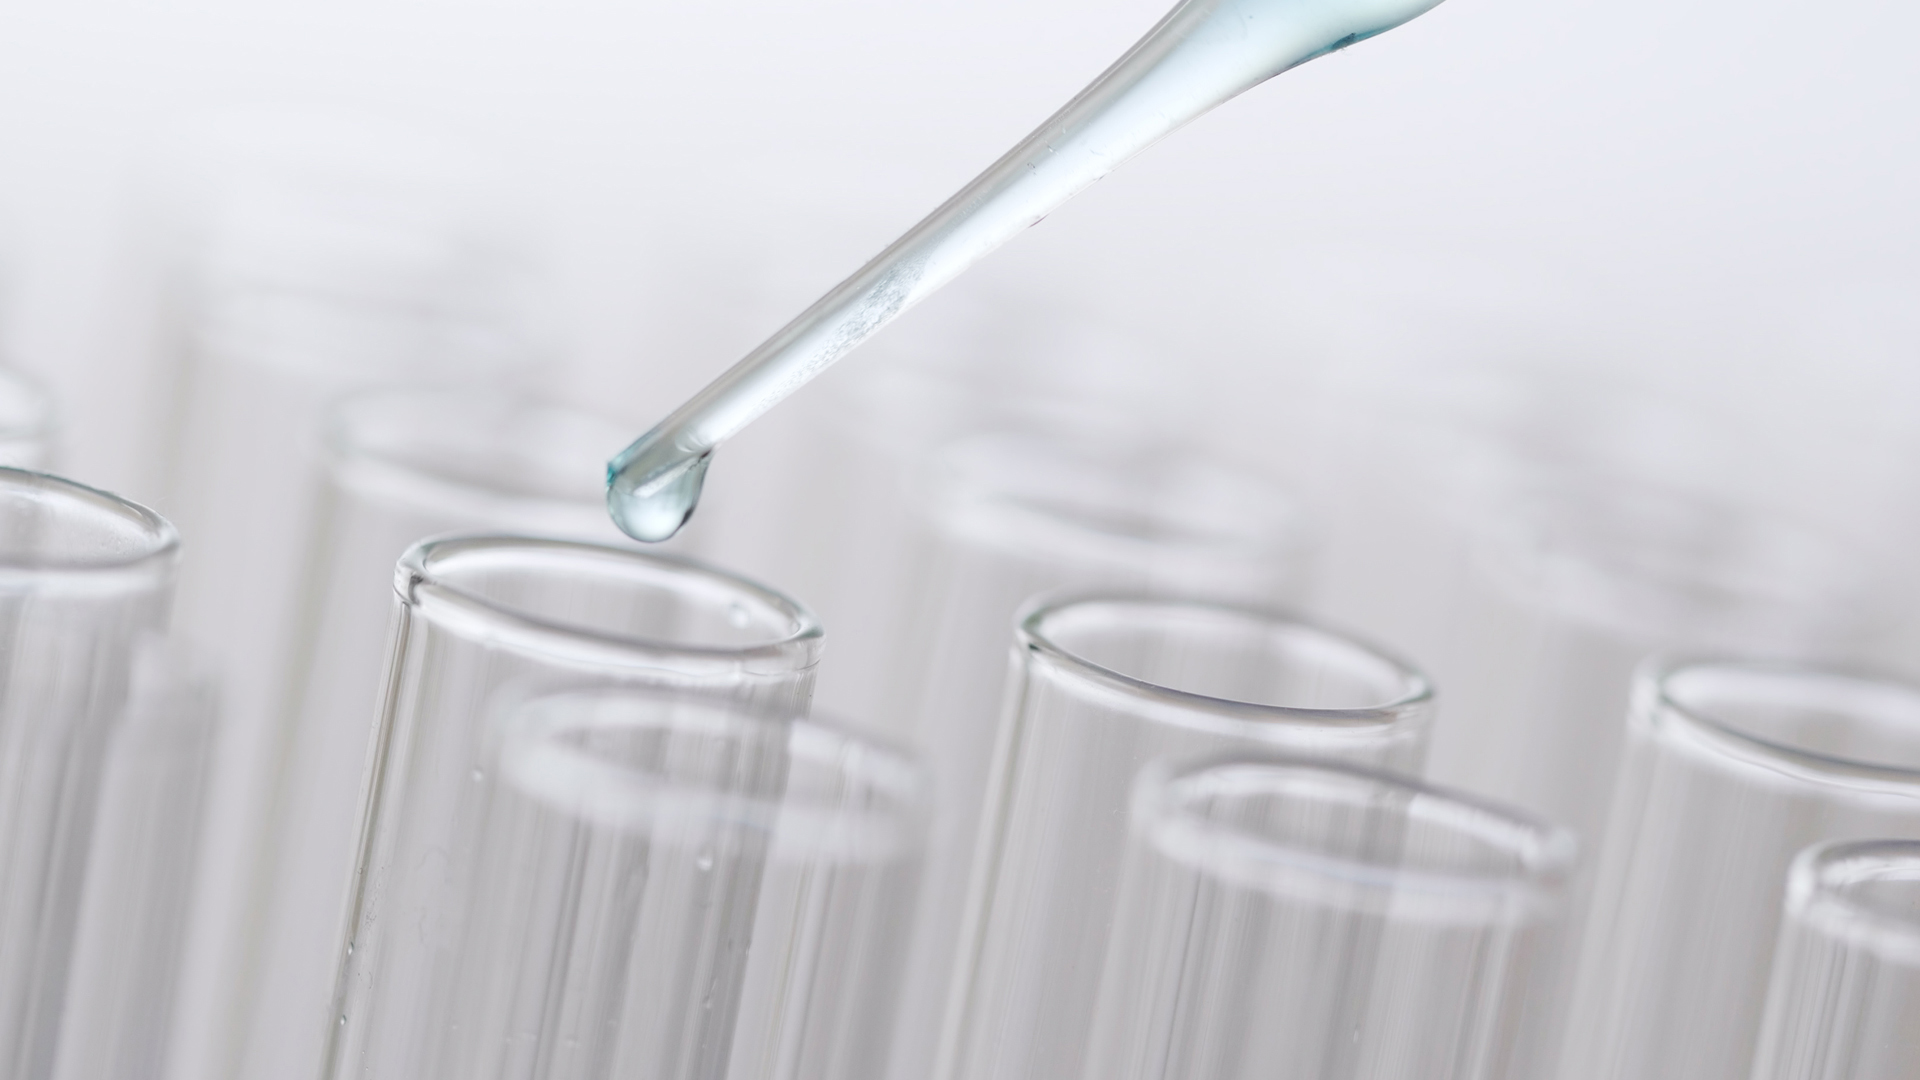 DOCUMENTS: Chinese, U.S. scientists had plans to engineer new coronavirus